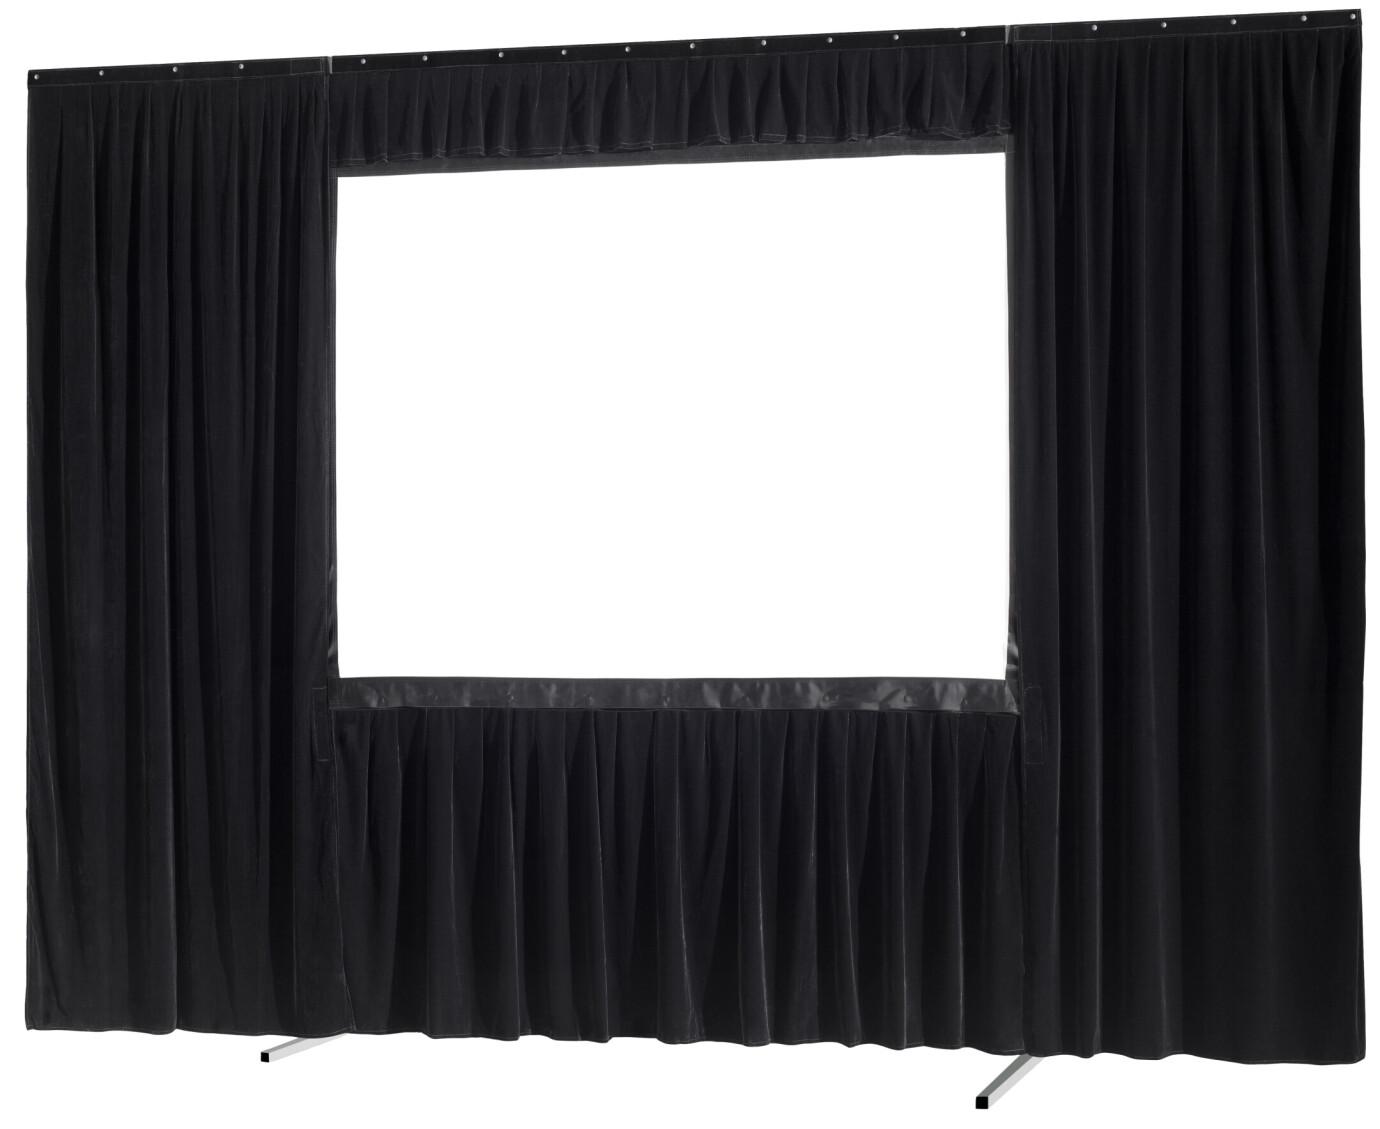 celexon Vorhangset 4-seitig für Faltrahmenleinwand Mobil Expert 244 x 137 cm